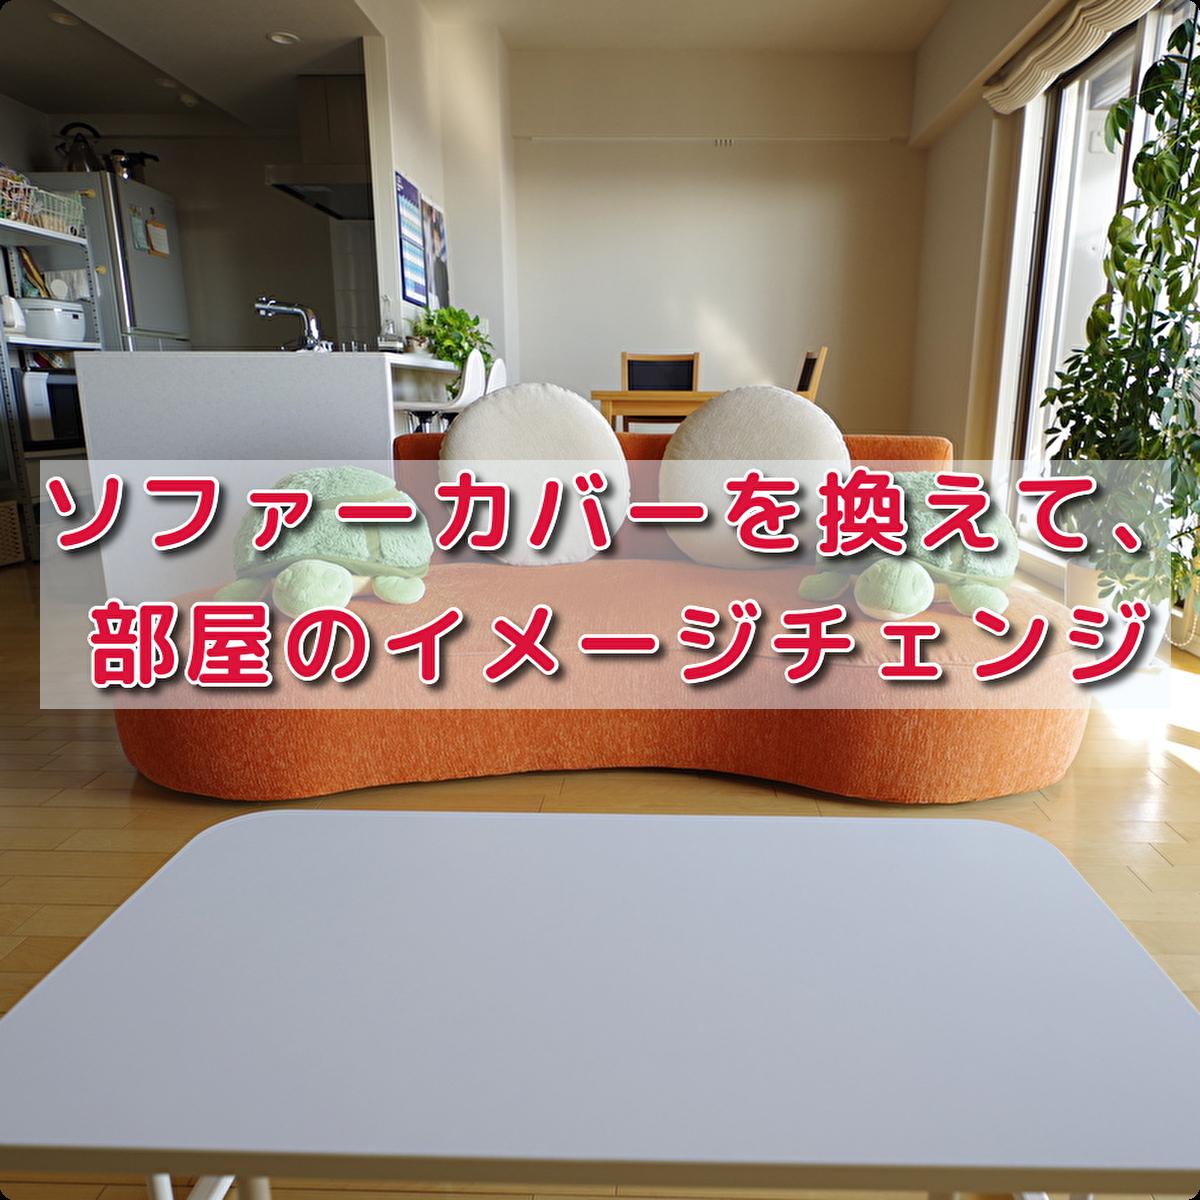 f:id:h_yukichi:20200104233300p:plain